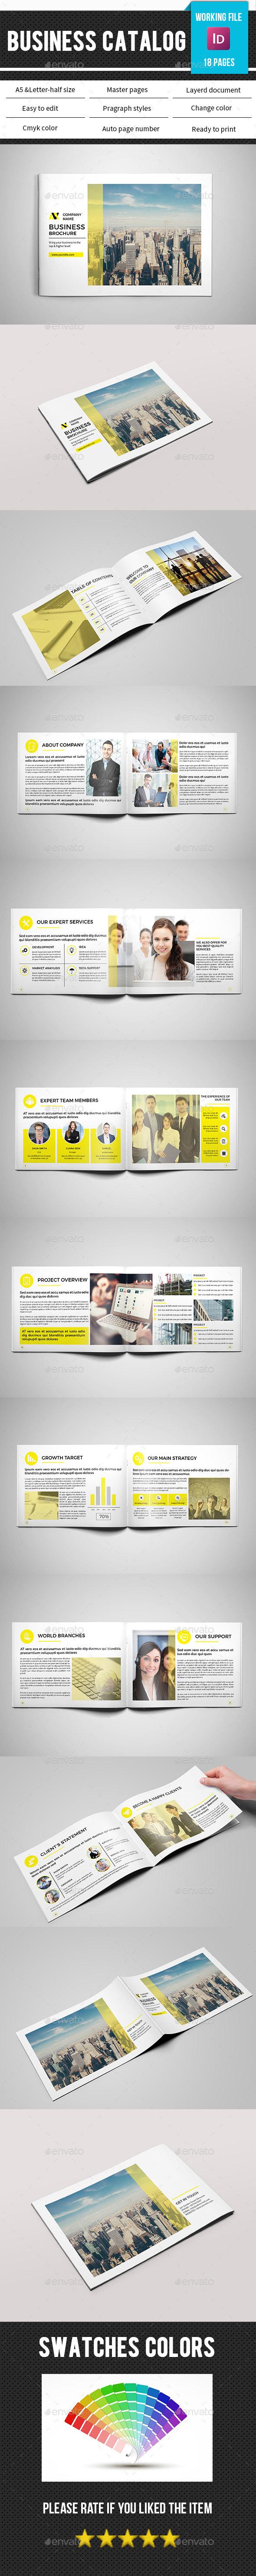 Corporate Catalog/Brochure-V186 - Catalogs Brochures